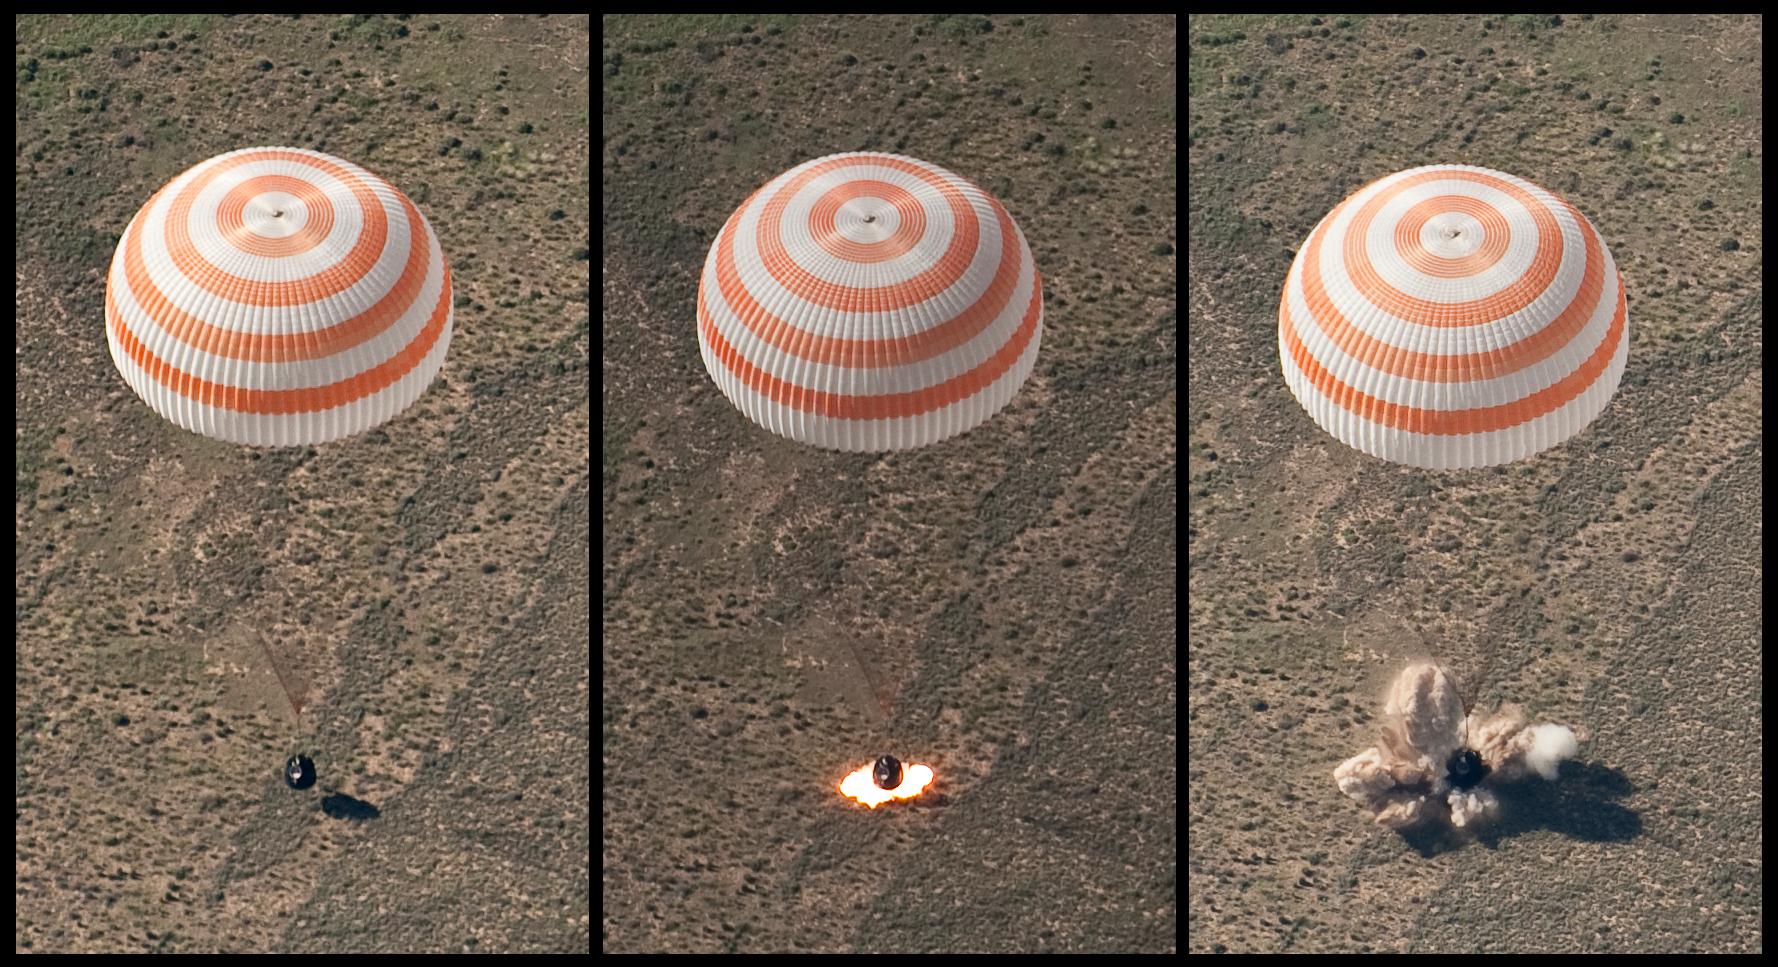 upload.wikimedia.org/wikipedia/commons/2/2a/Soyuz_TMA-17_retro-rockets_firing_during_landing.jpg